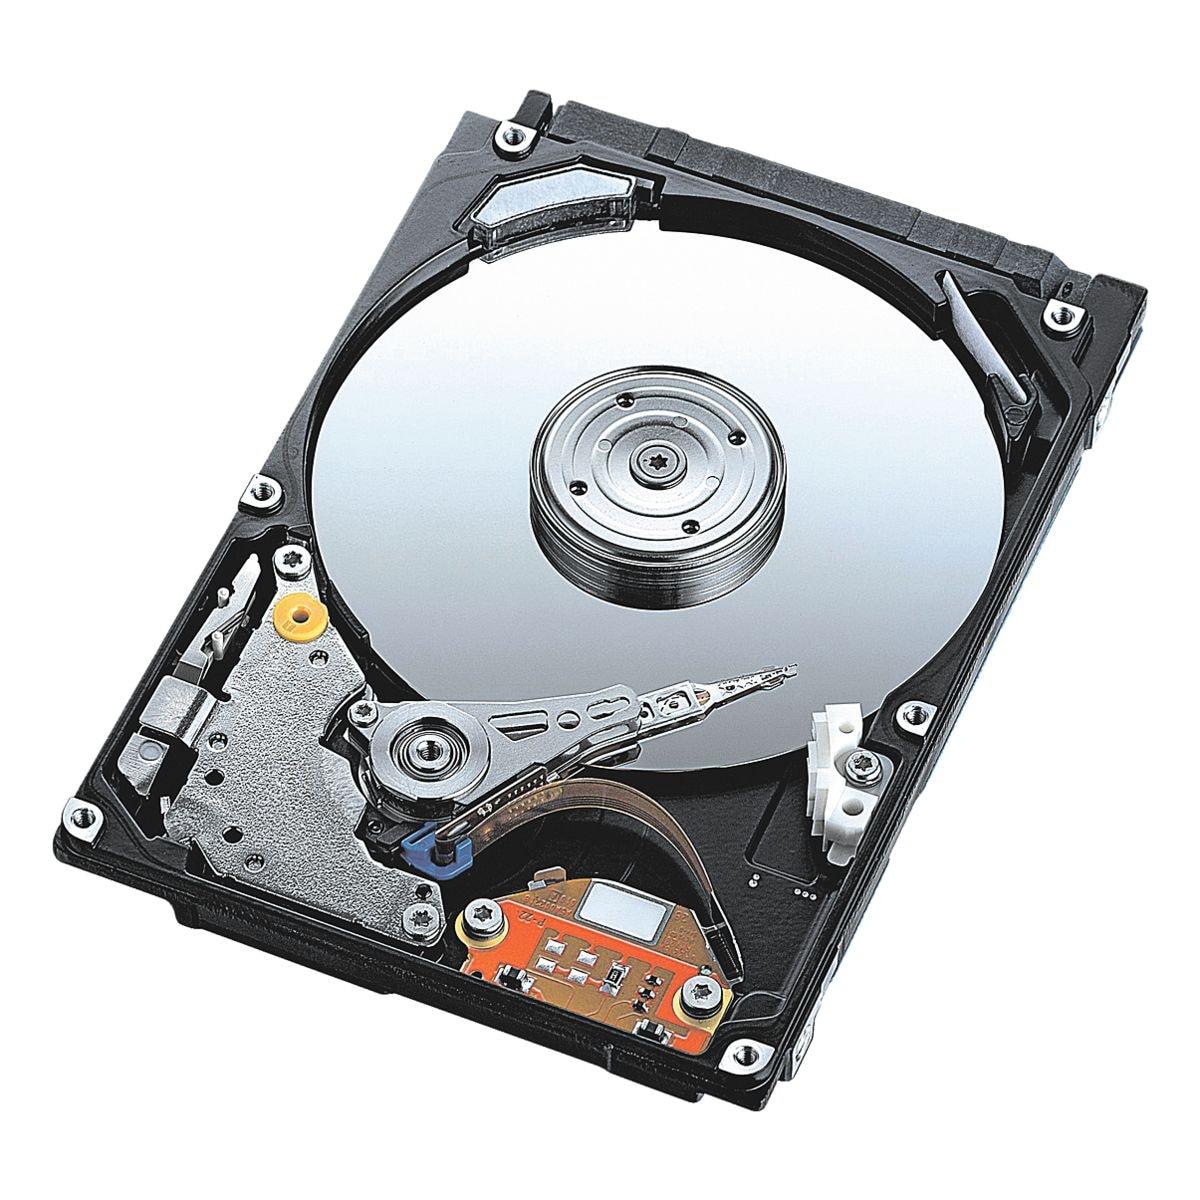 Intenso Interne HDD Retailpack 1 TB, interne HDD-Festplatte, 6,35 cm (2,5 Zoll)